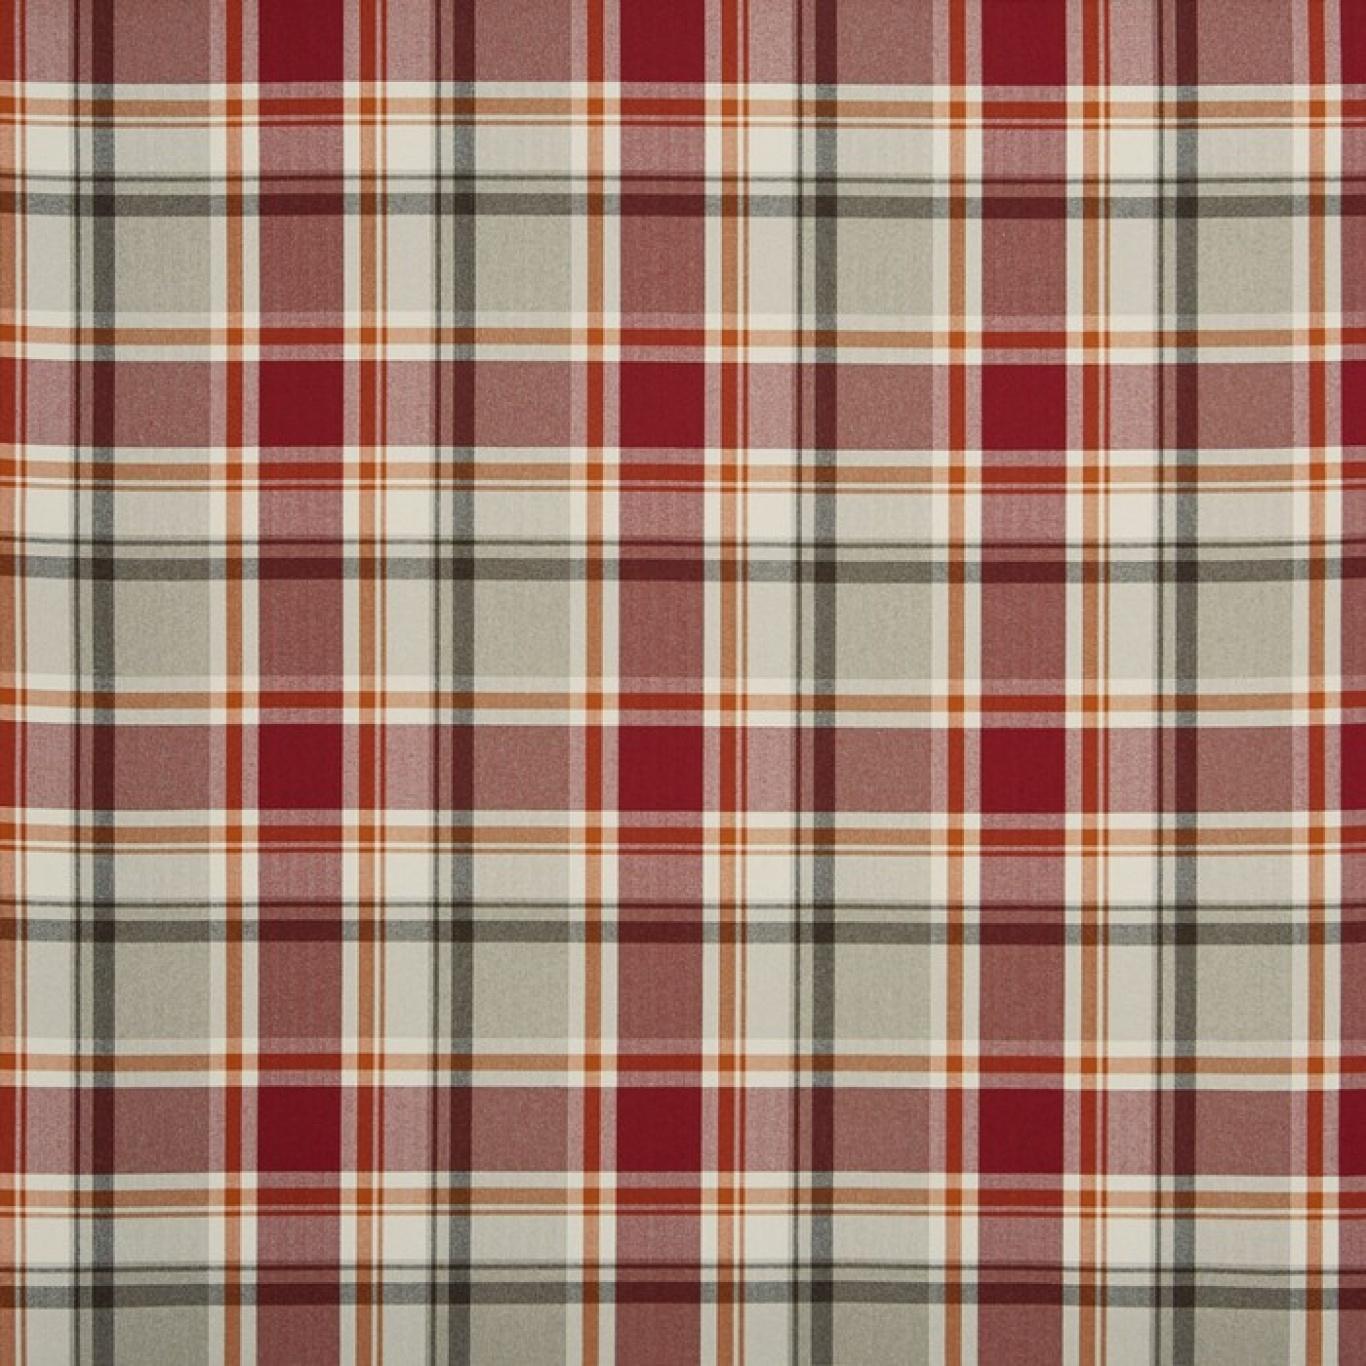 Image of Prestigious Belmont Cranberry FR Fabric 2016/316